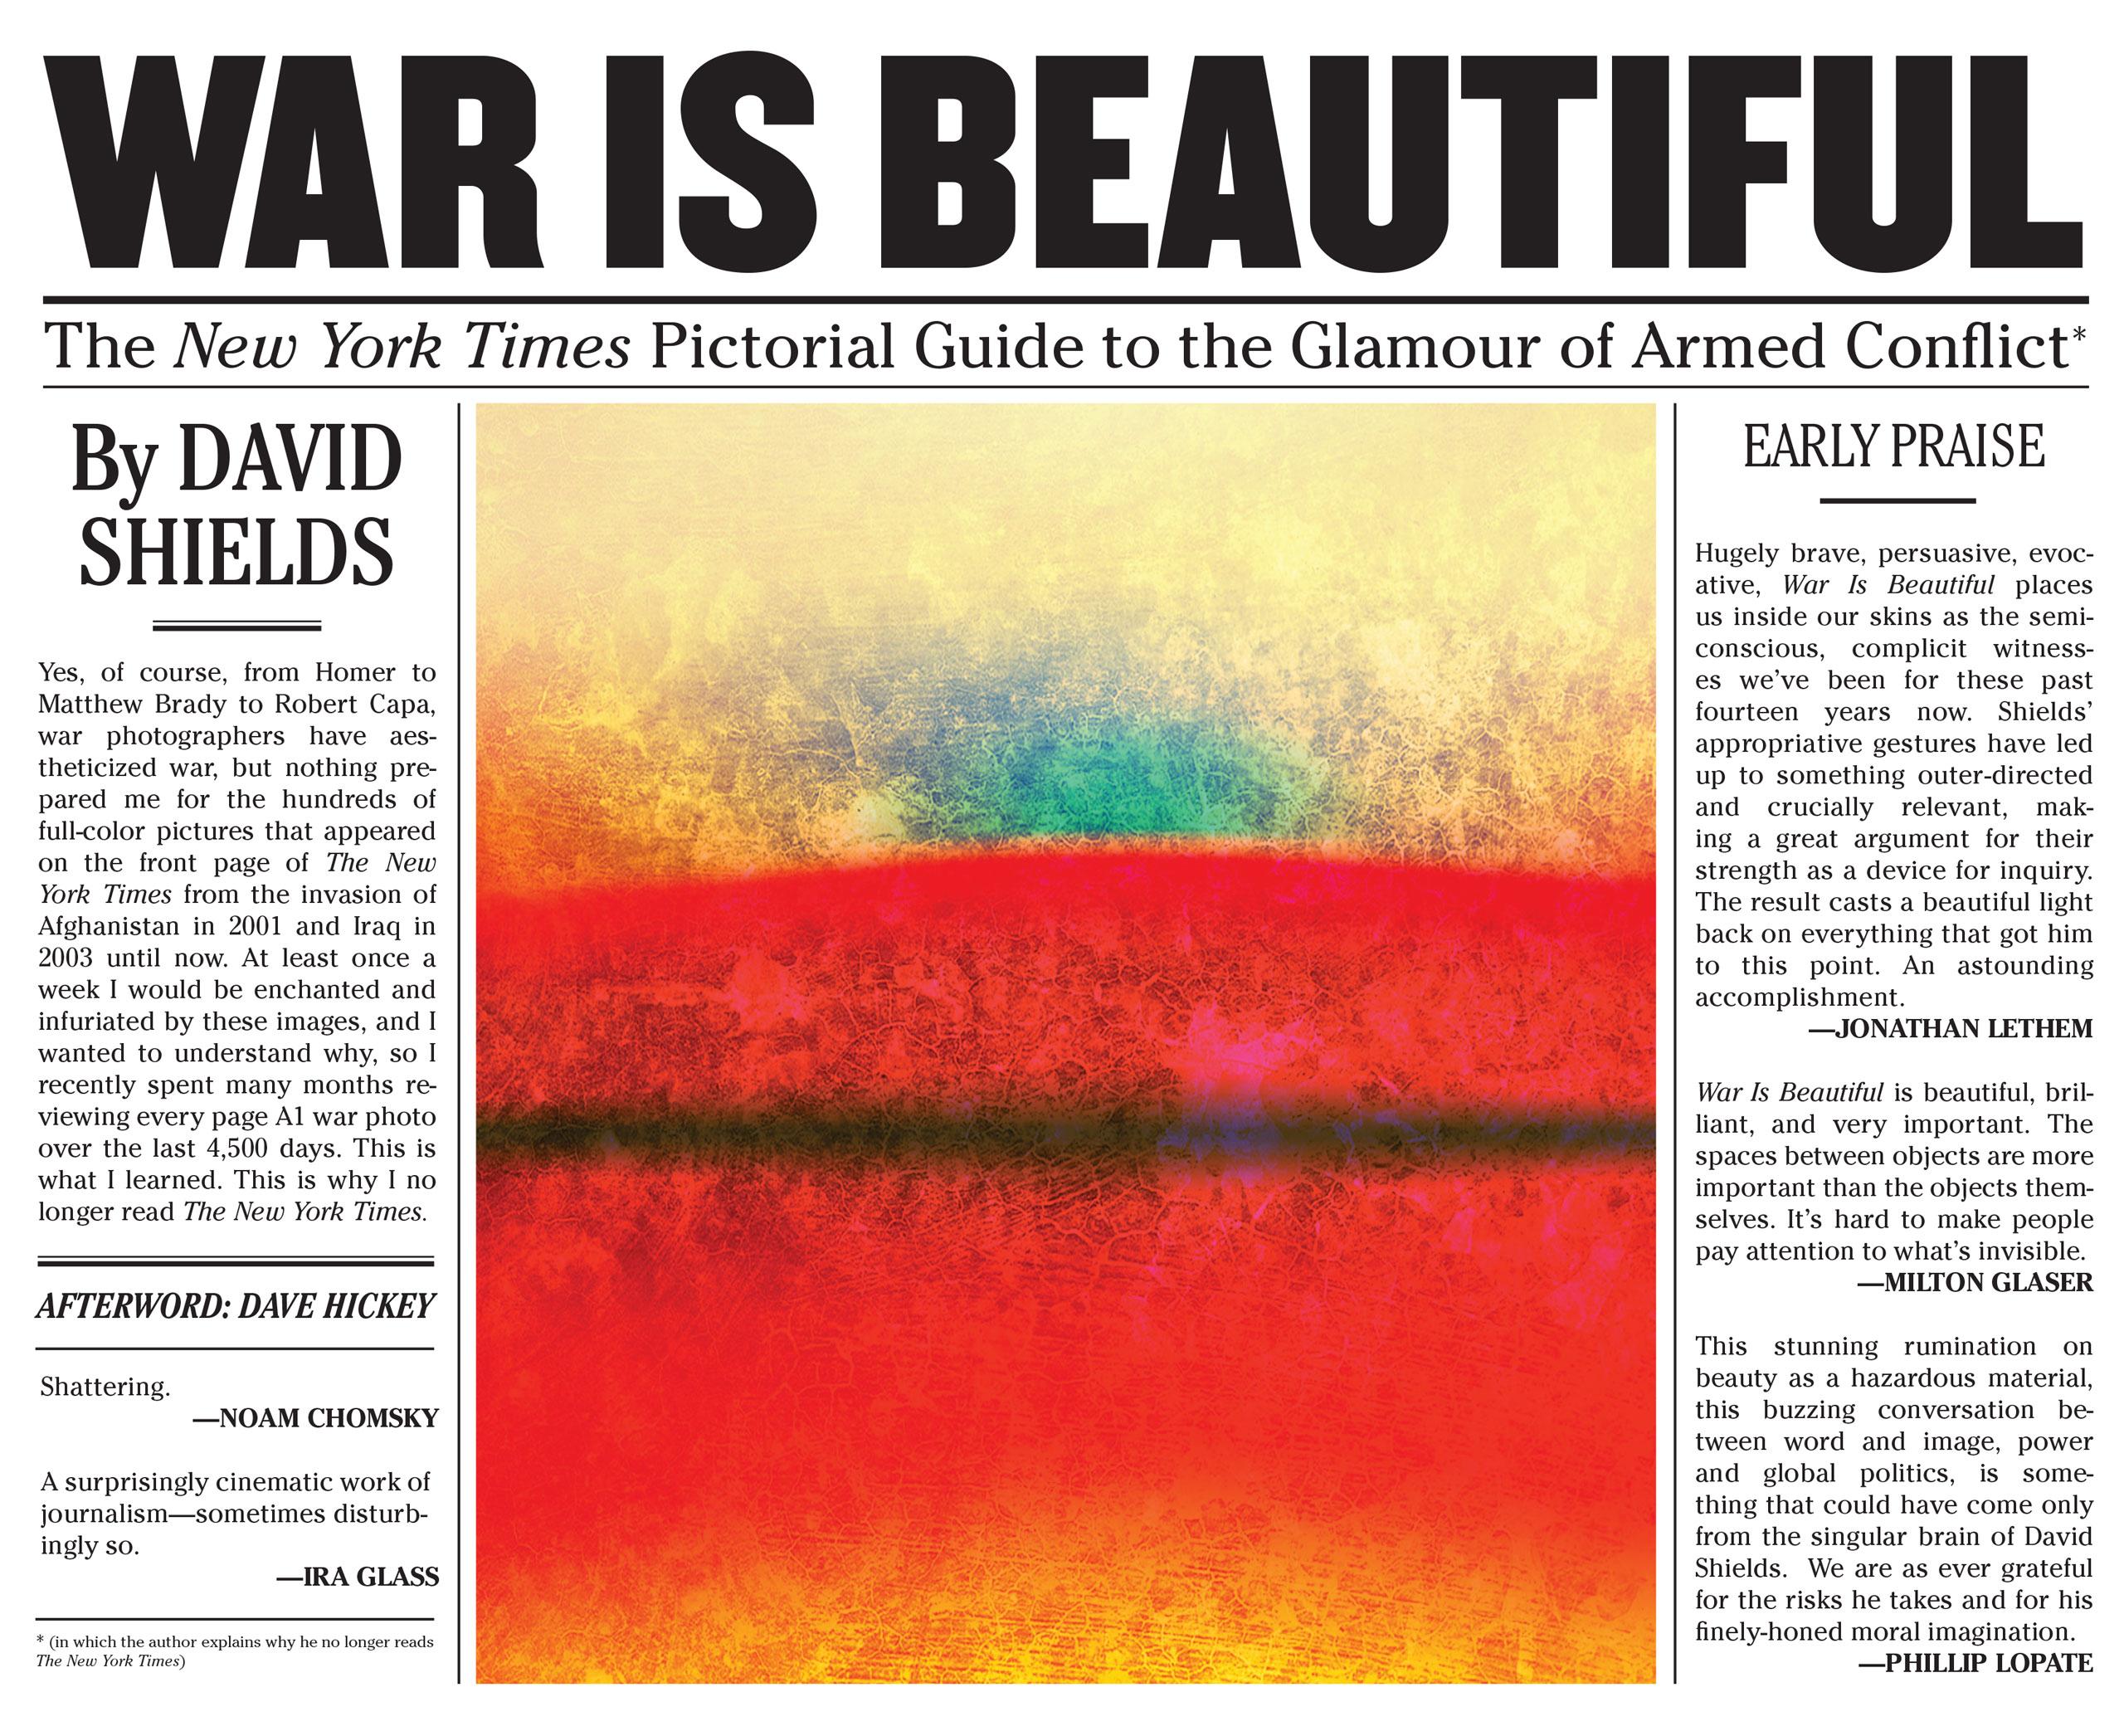 War is Beautiful by David Shields